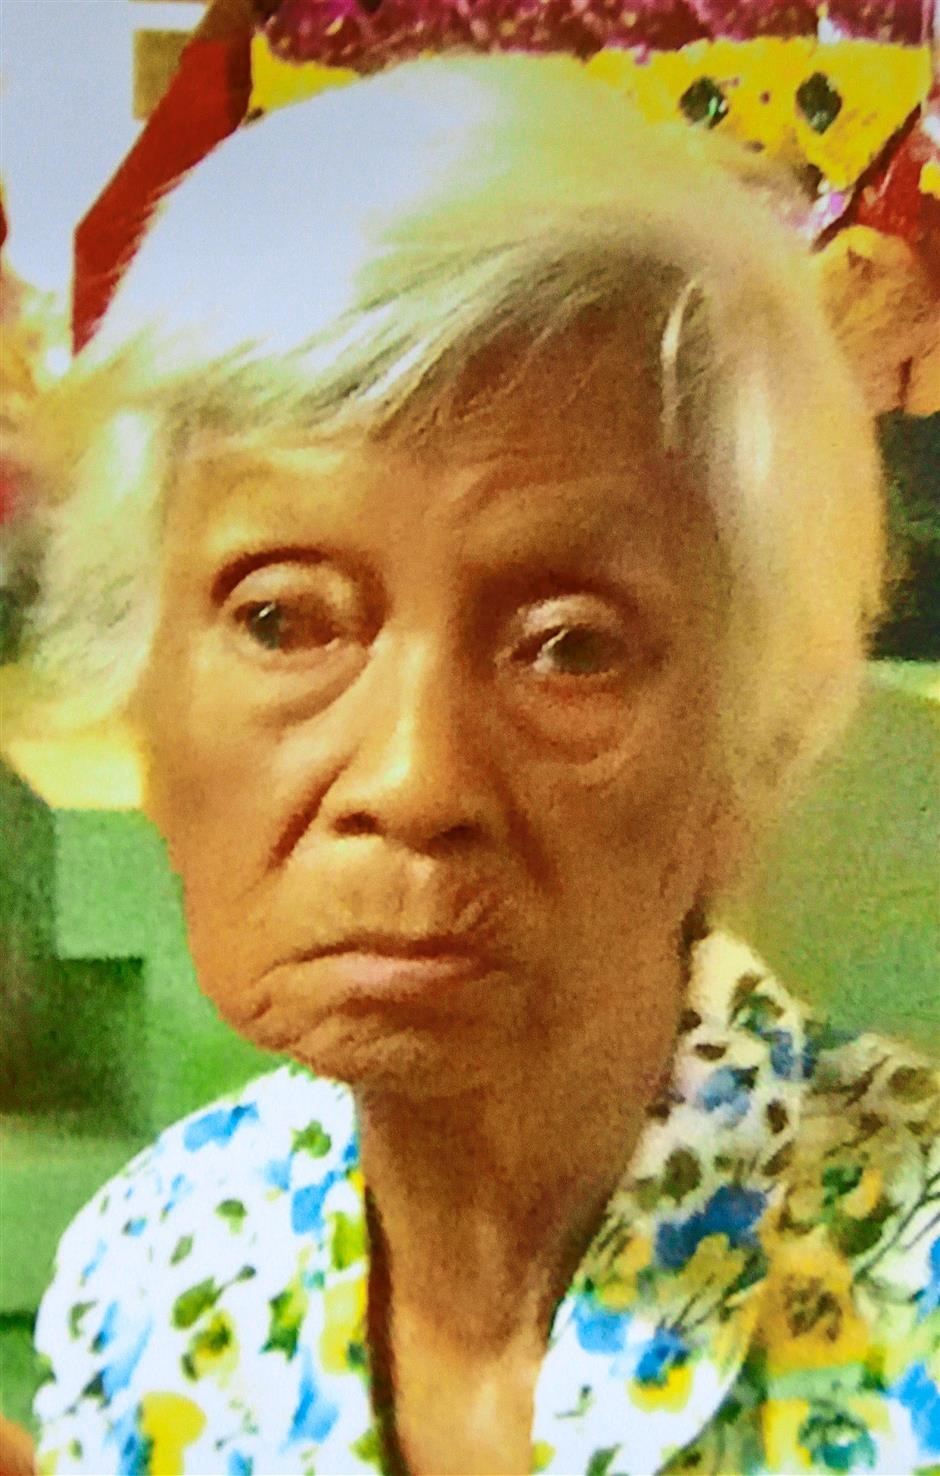 Semi-senile grandma missing after food court drop-off ...